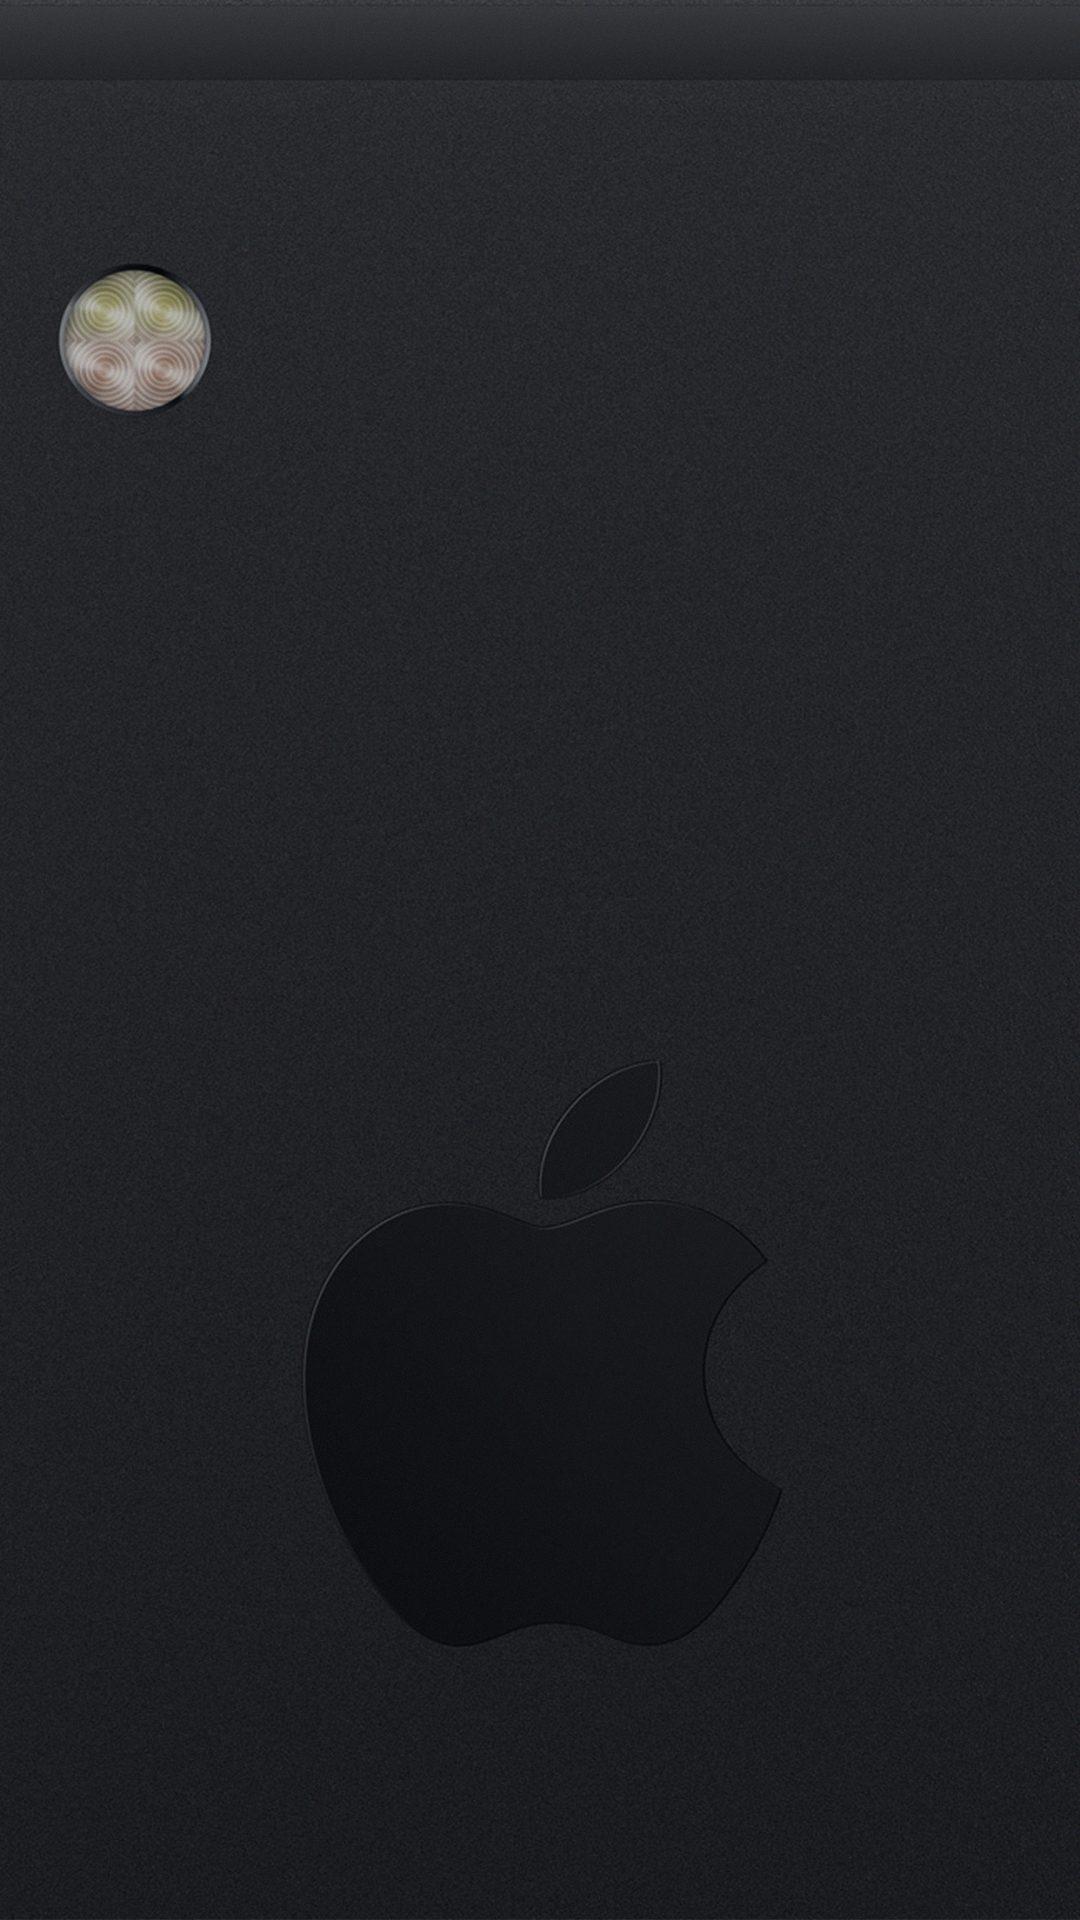 Back Iphone7 Black Apple Art Illustration